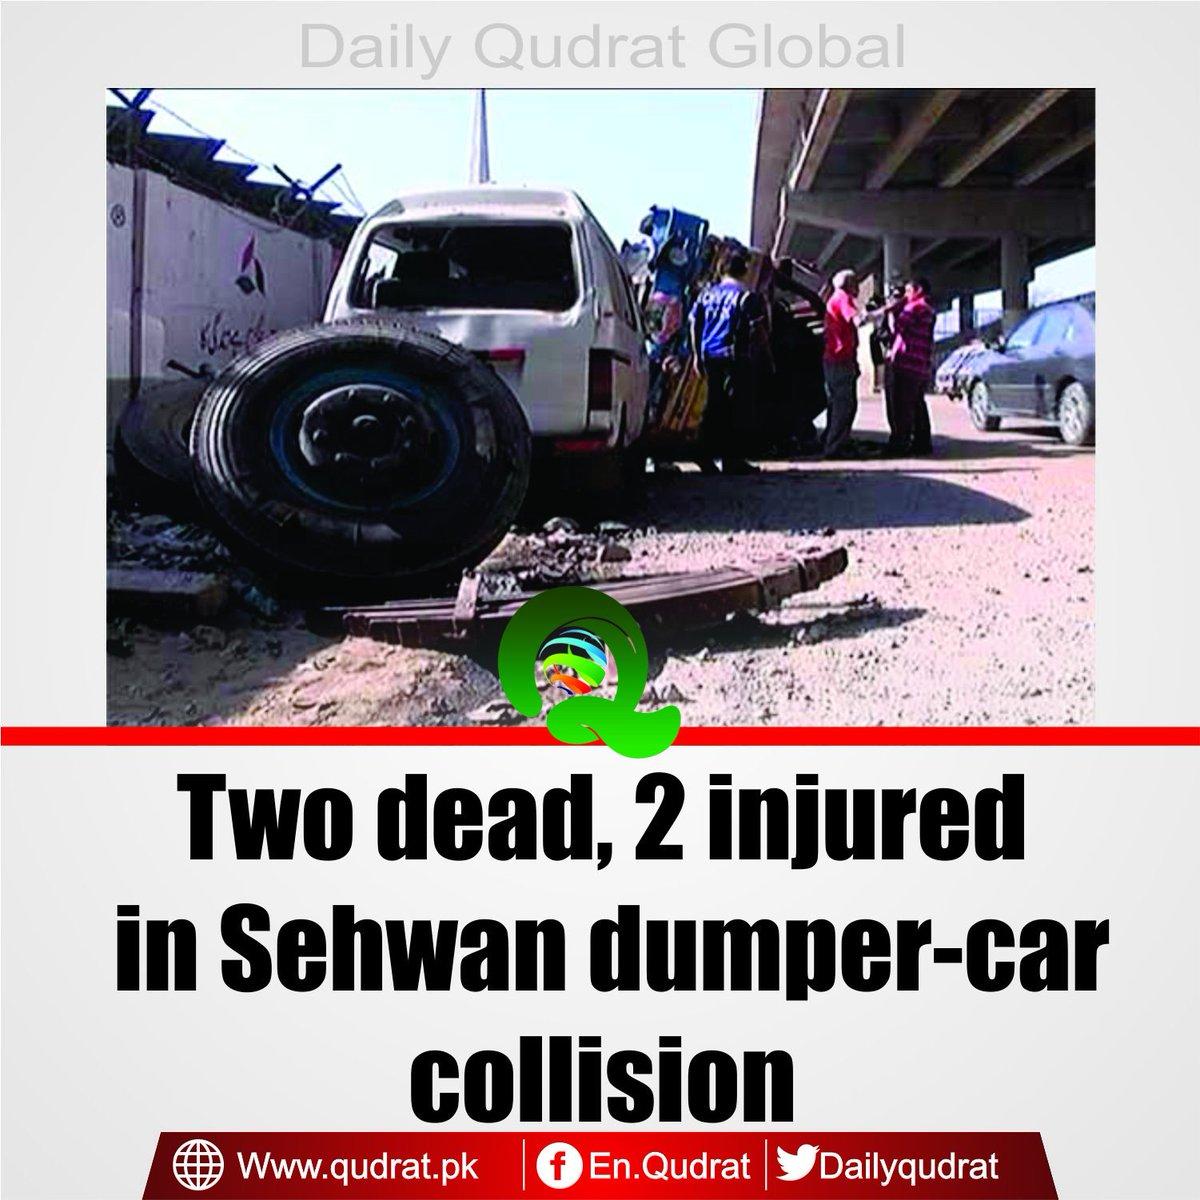 test Twitter Media - Read More:https://t.co/J4rAltxpOZ  Two #dead, 2 #injured in #Sehwan #dumper-car #collision https://t.co/7RpSauTxIv